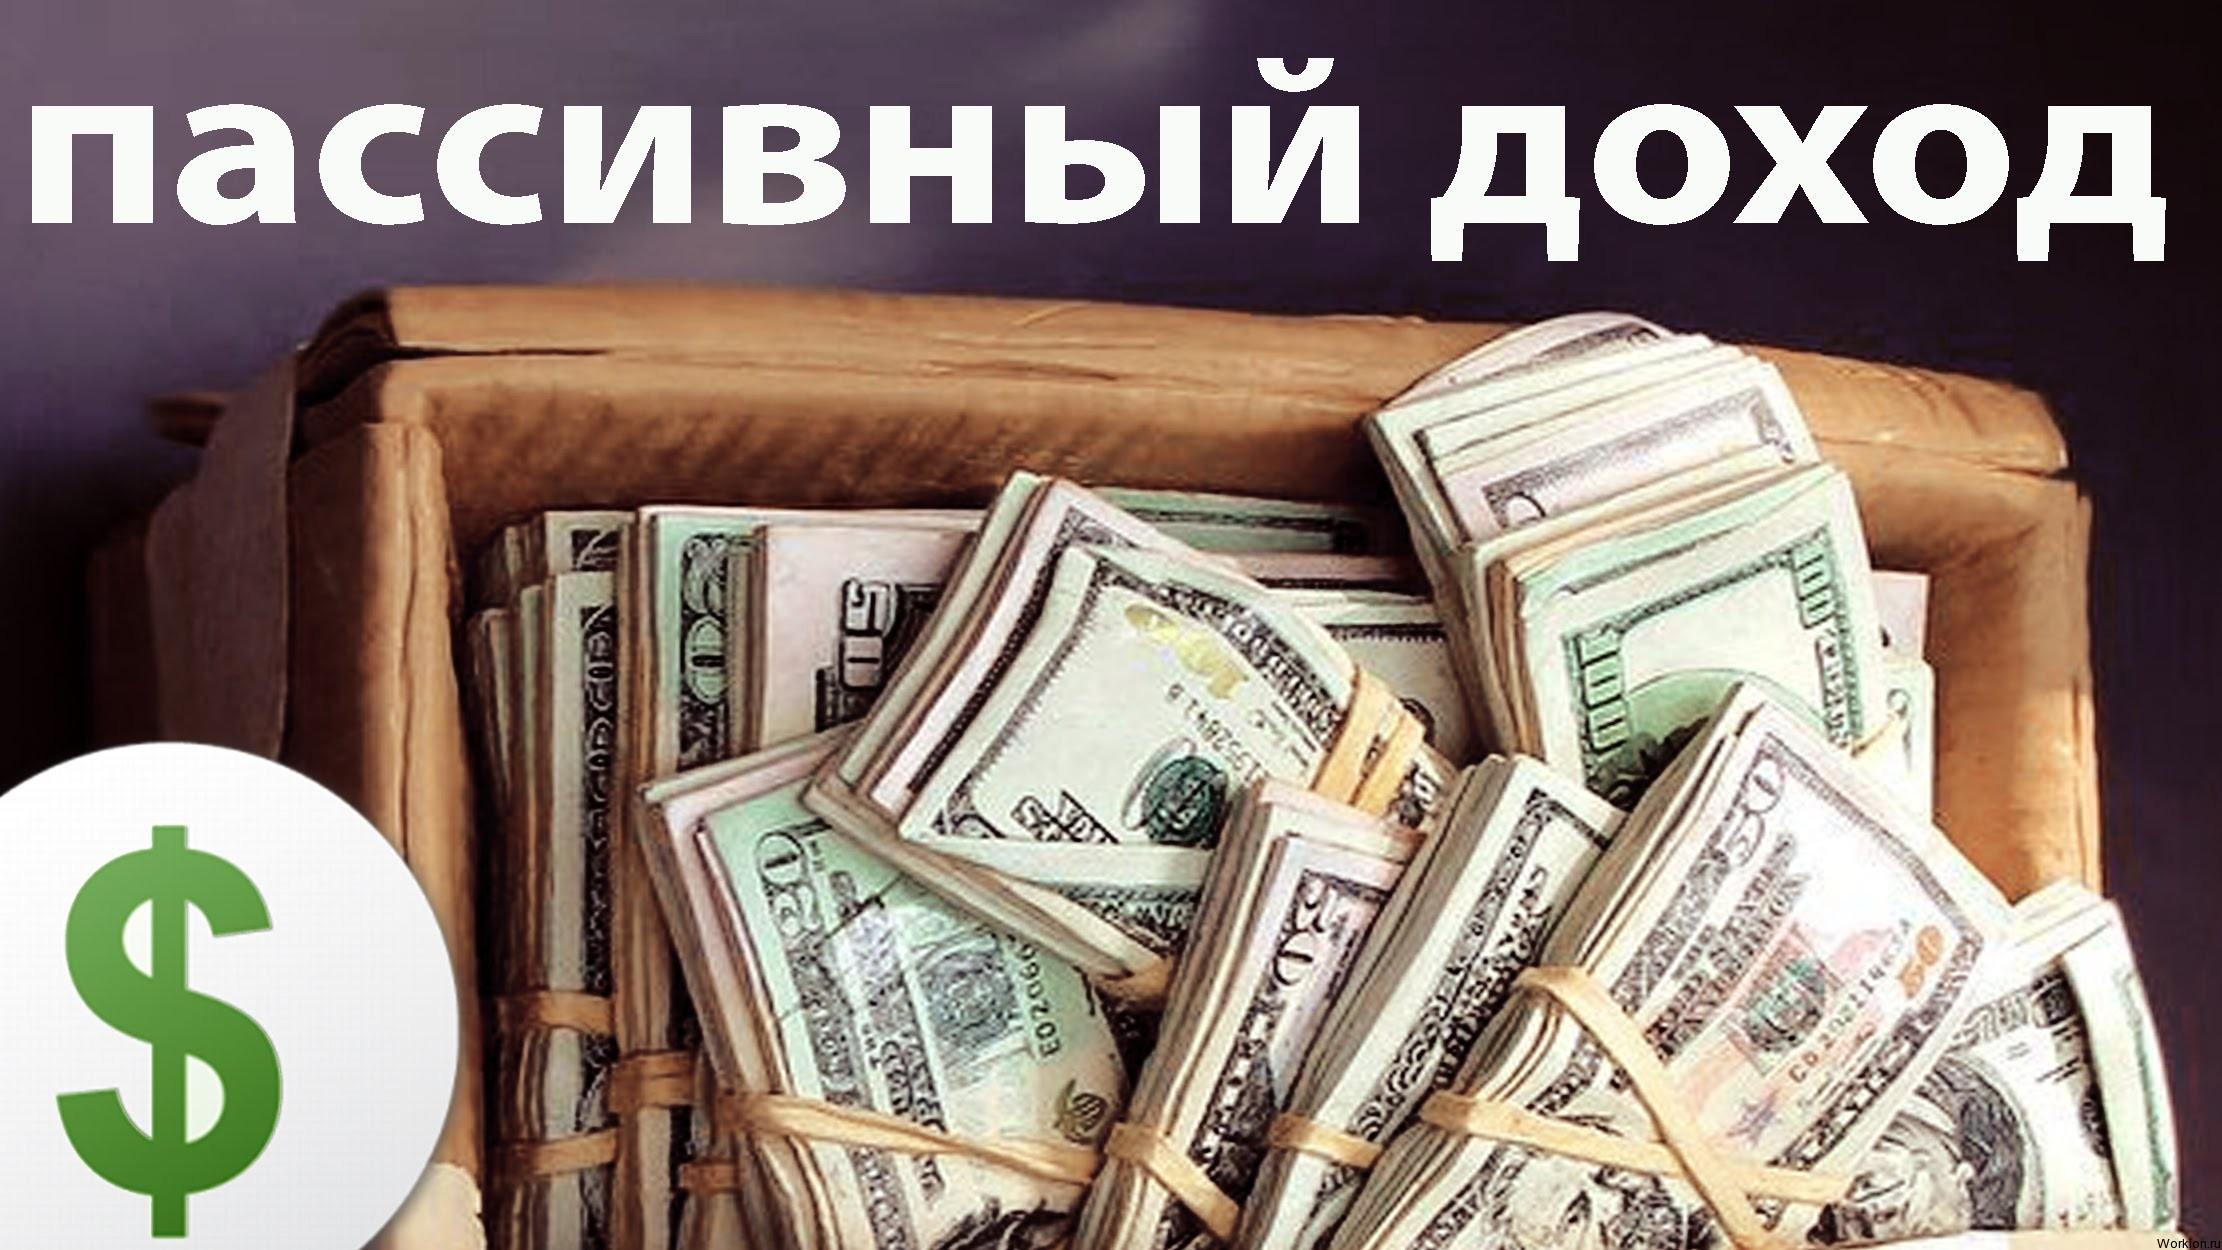 GPC face bani